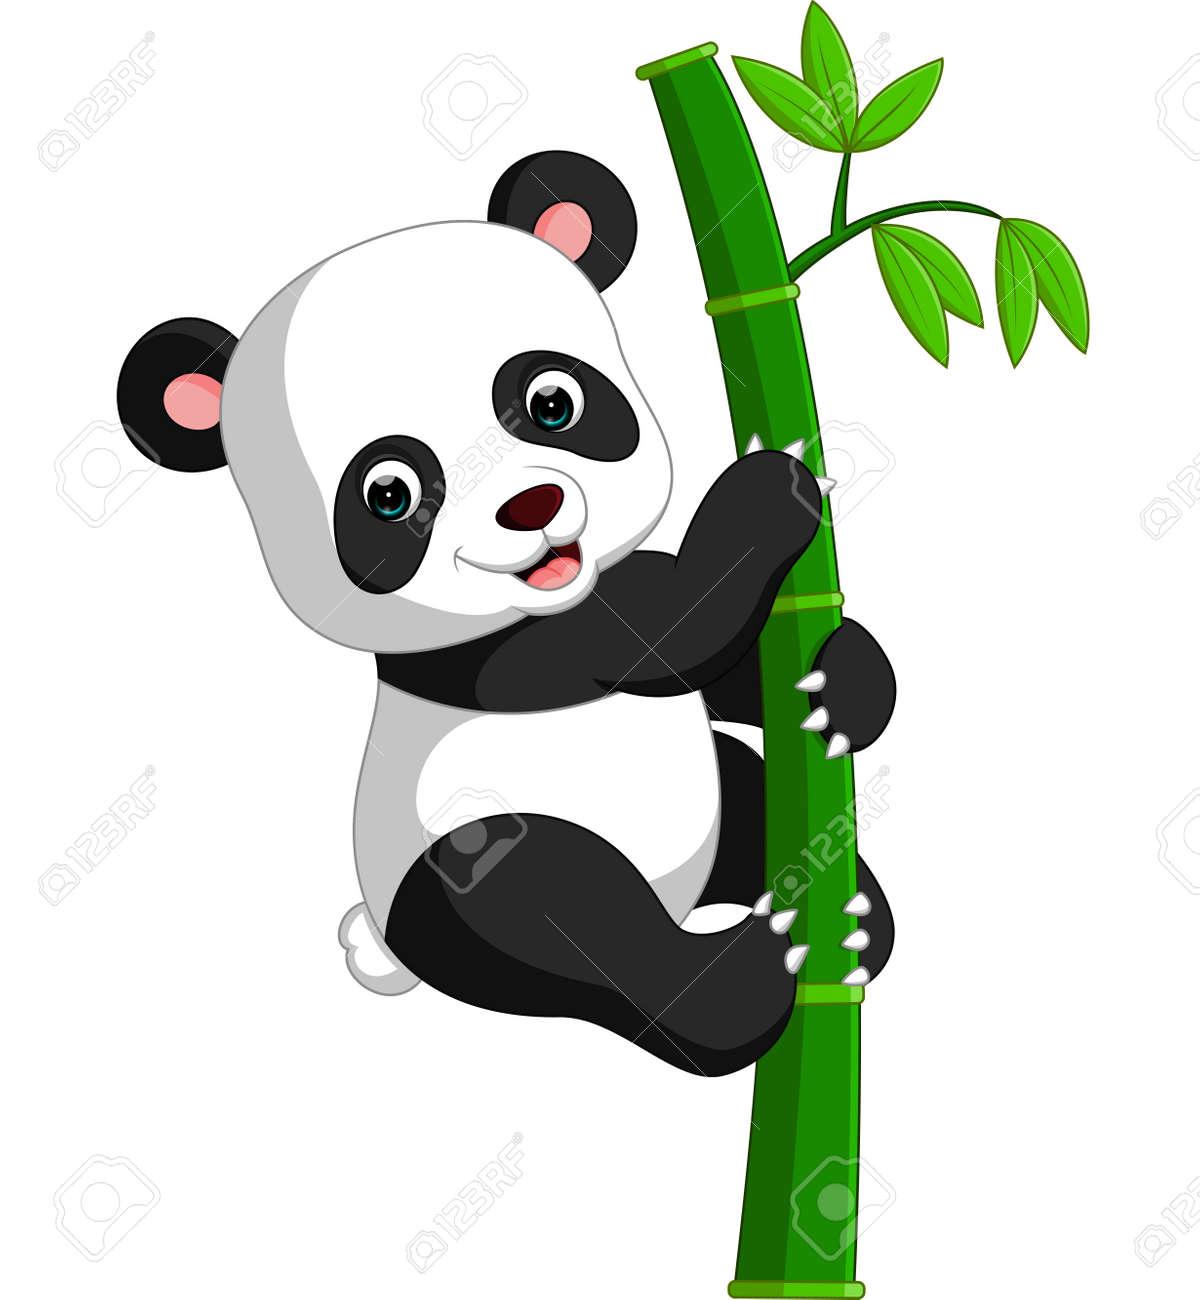 Dessin De Panda Facile Et Mignon